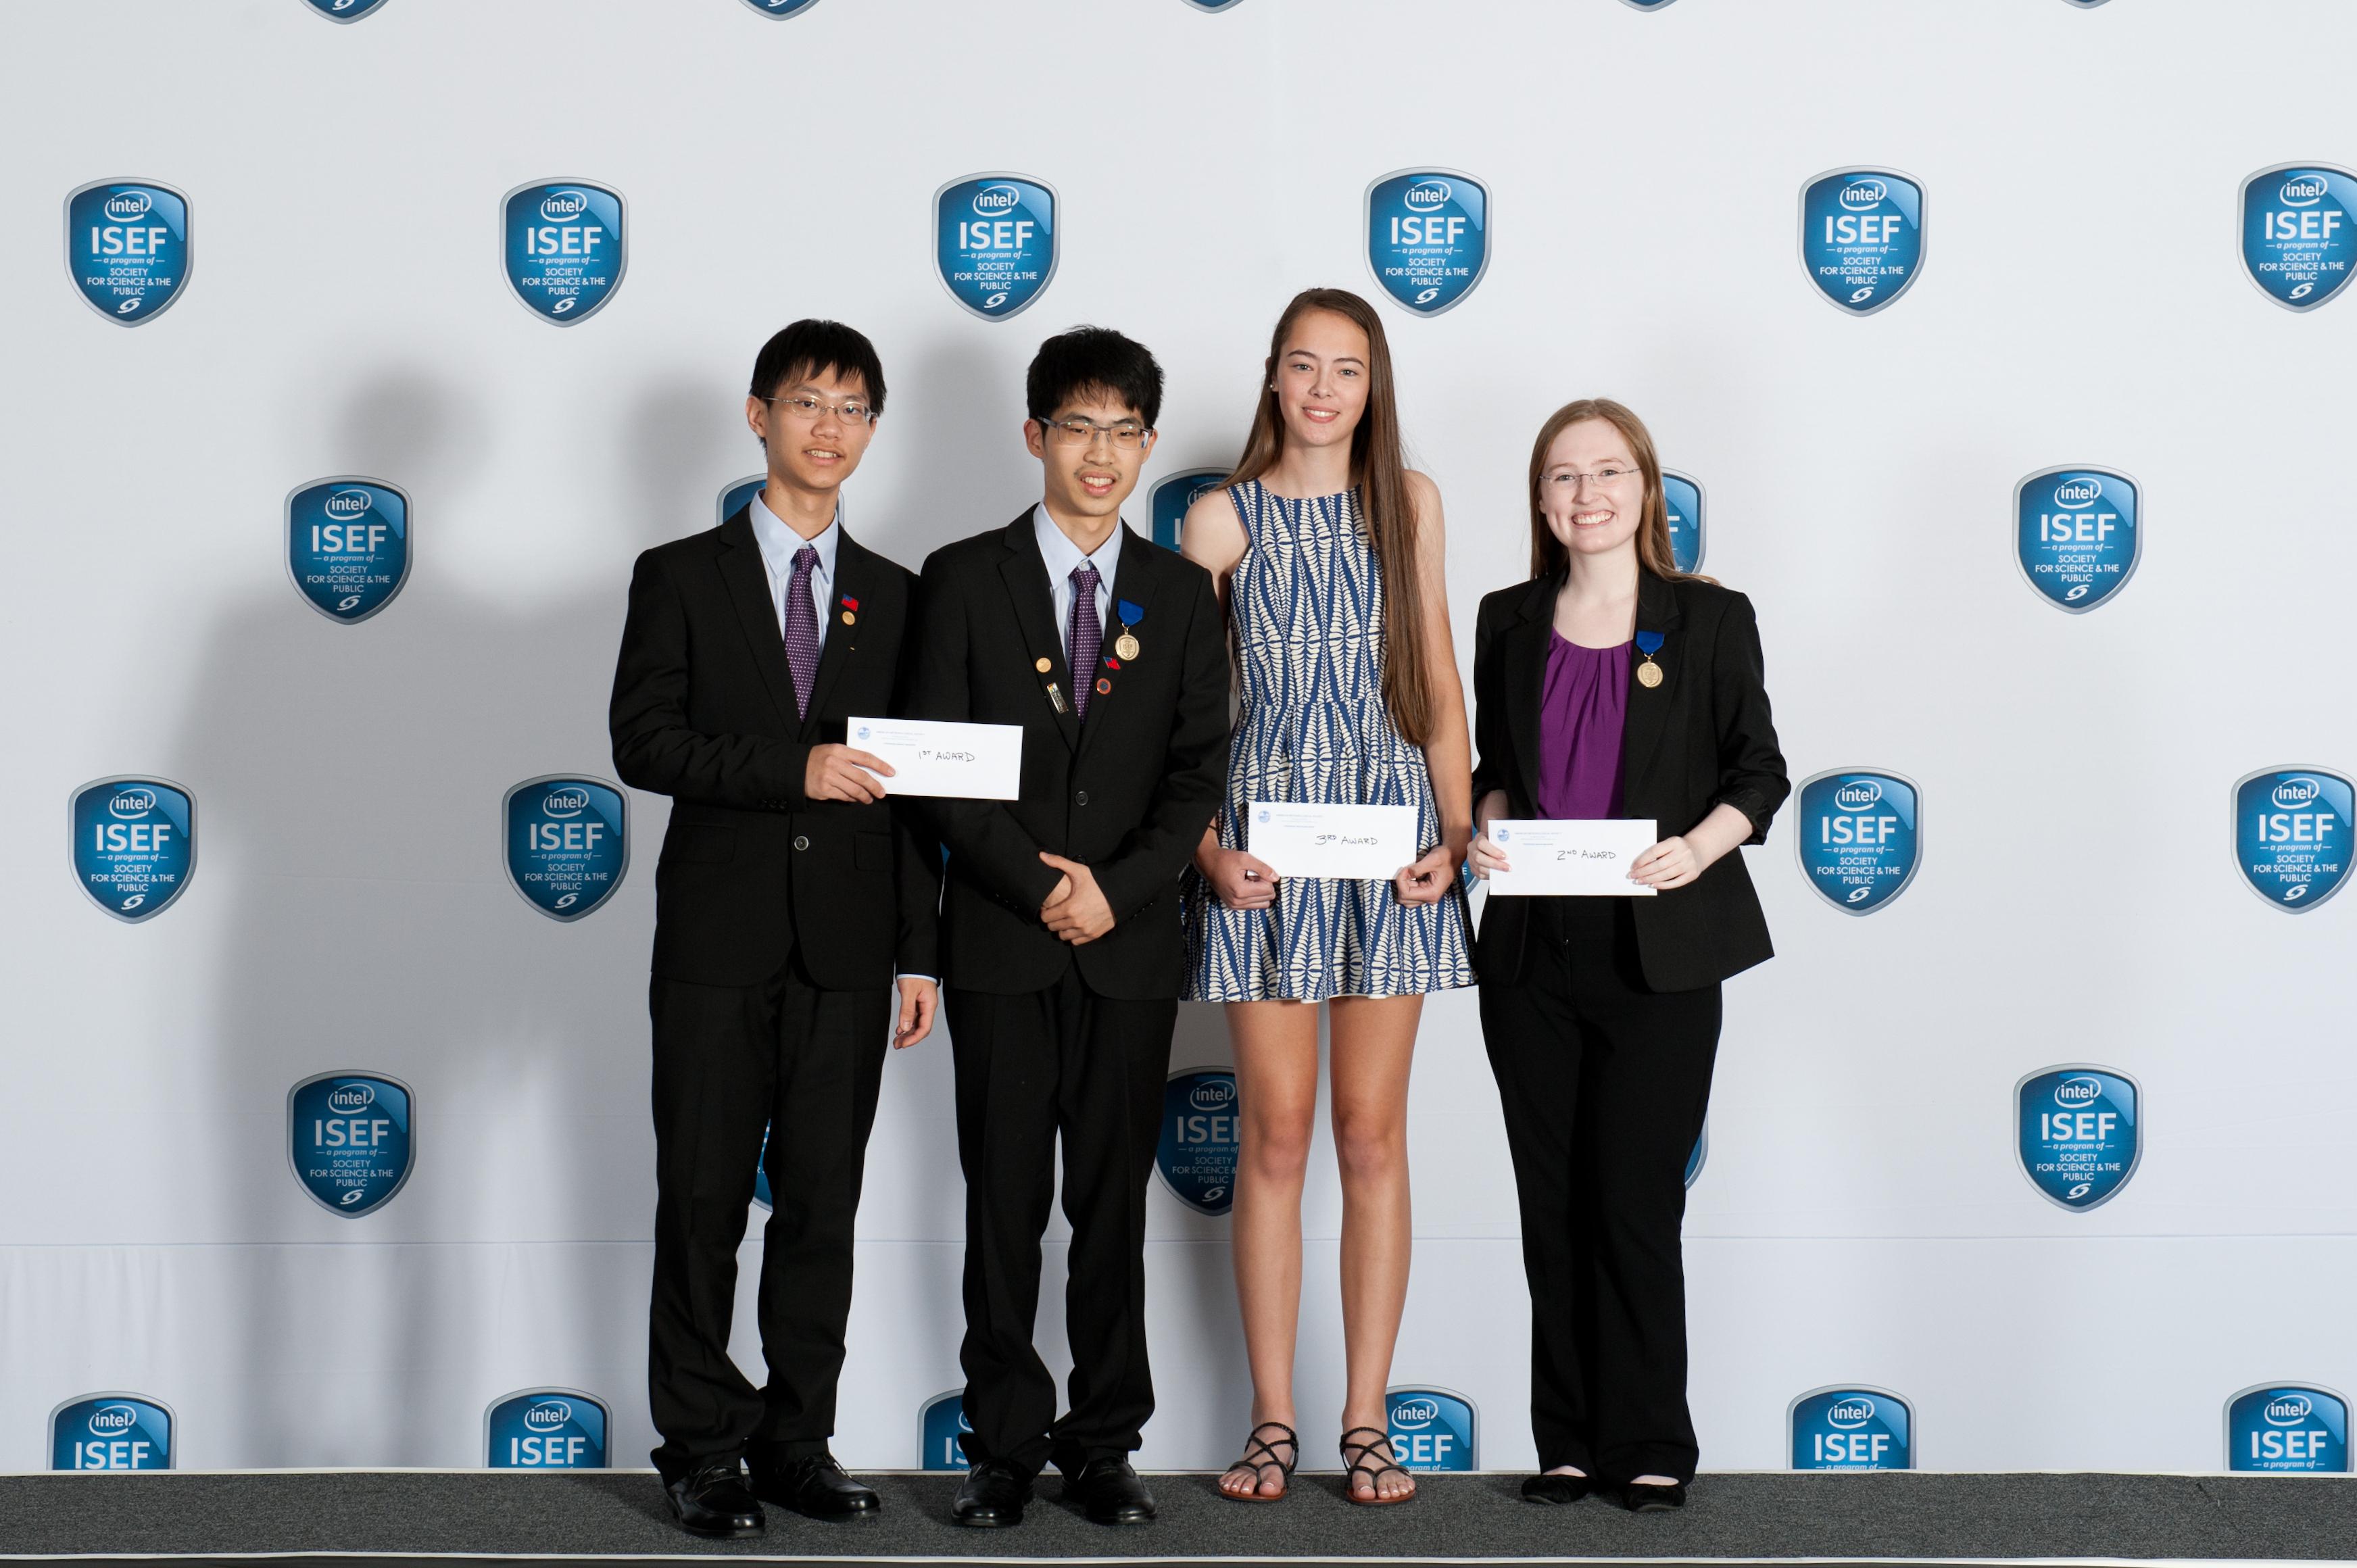 AMS award winners from Intel ISEF 2016, including Stephanie Shi-Ning Mui, Ekaterina Lebedeva, Phuong Anh Tran, Muhammad Ugur oglu Abdulla, Pei-Hsuan Chang, Qingxuan Jiang, Osvaldo J. Pagan, and Dariannette Valentin.